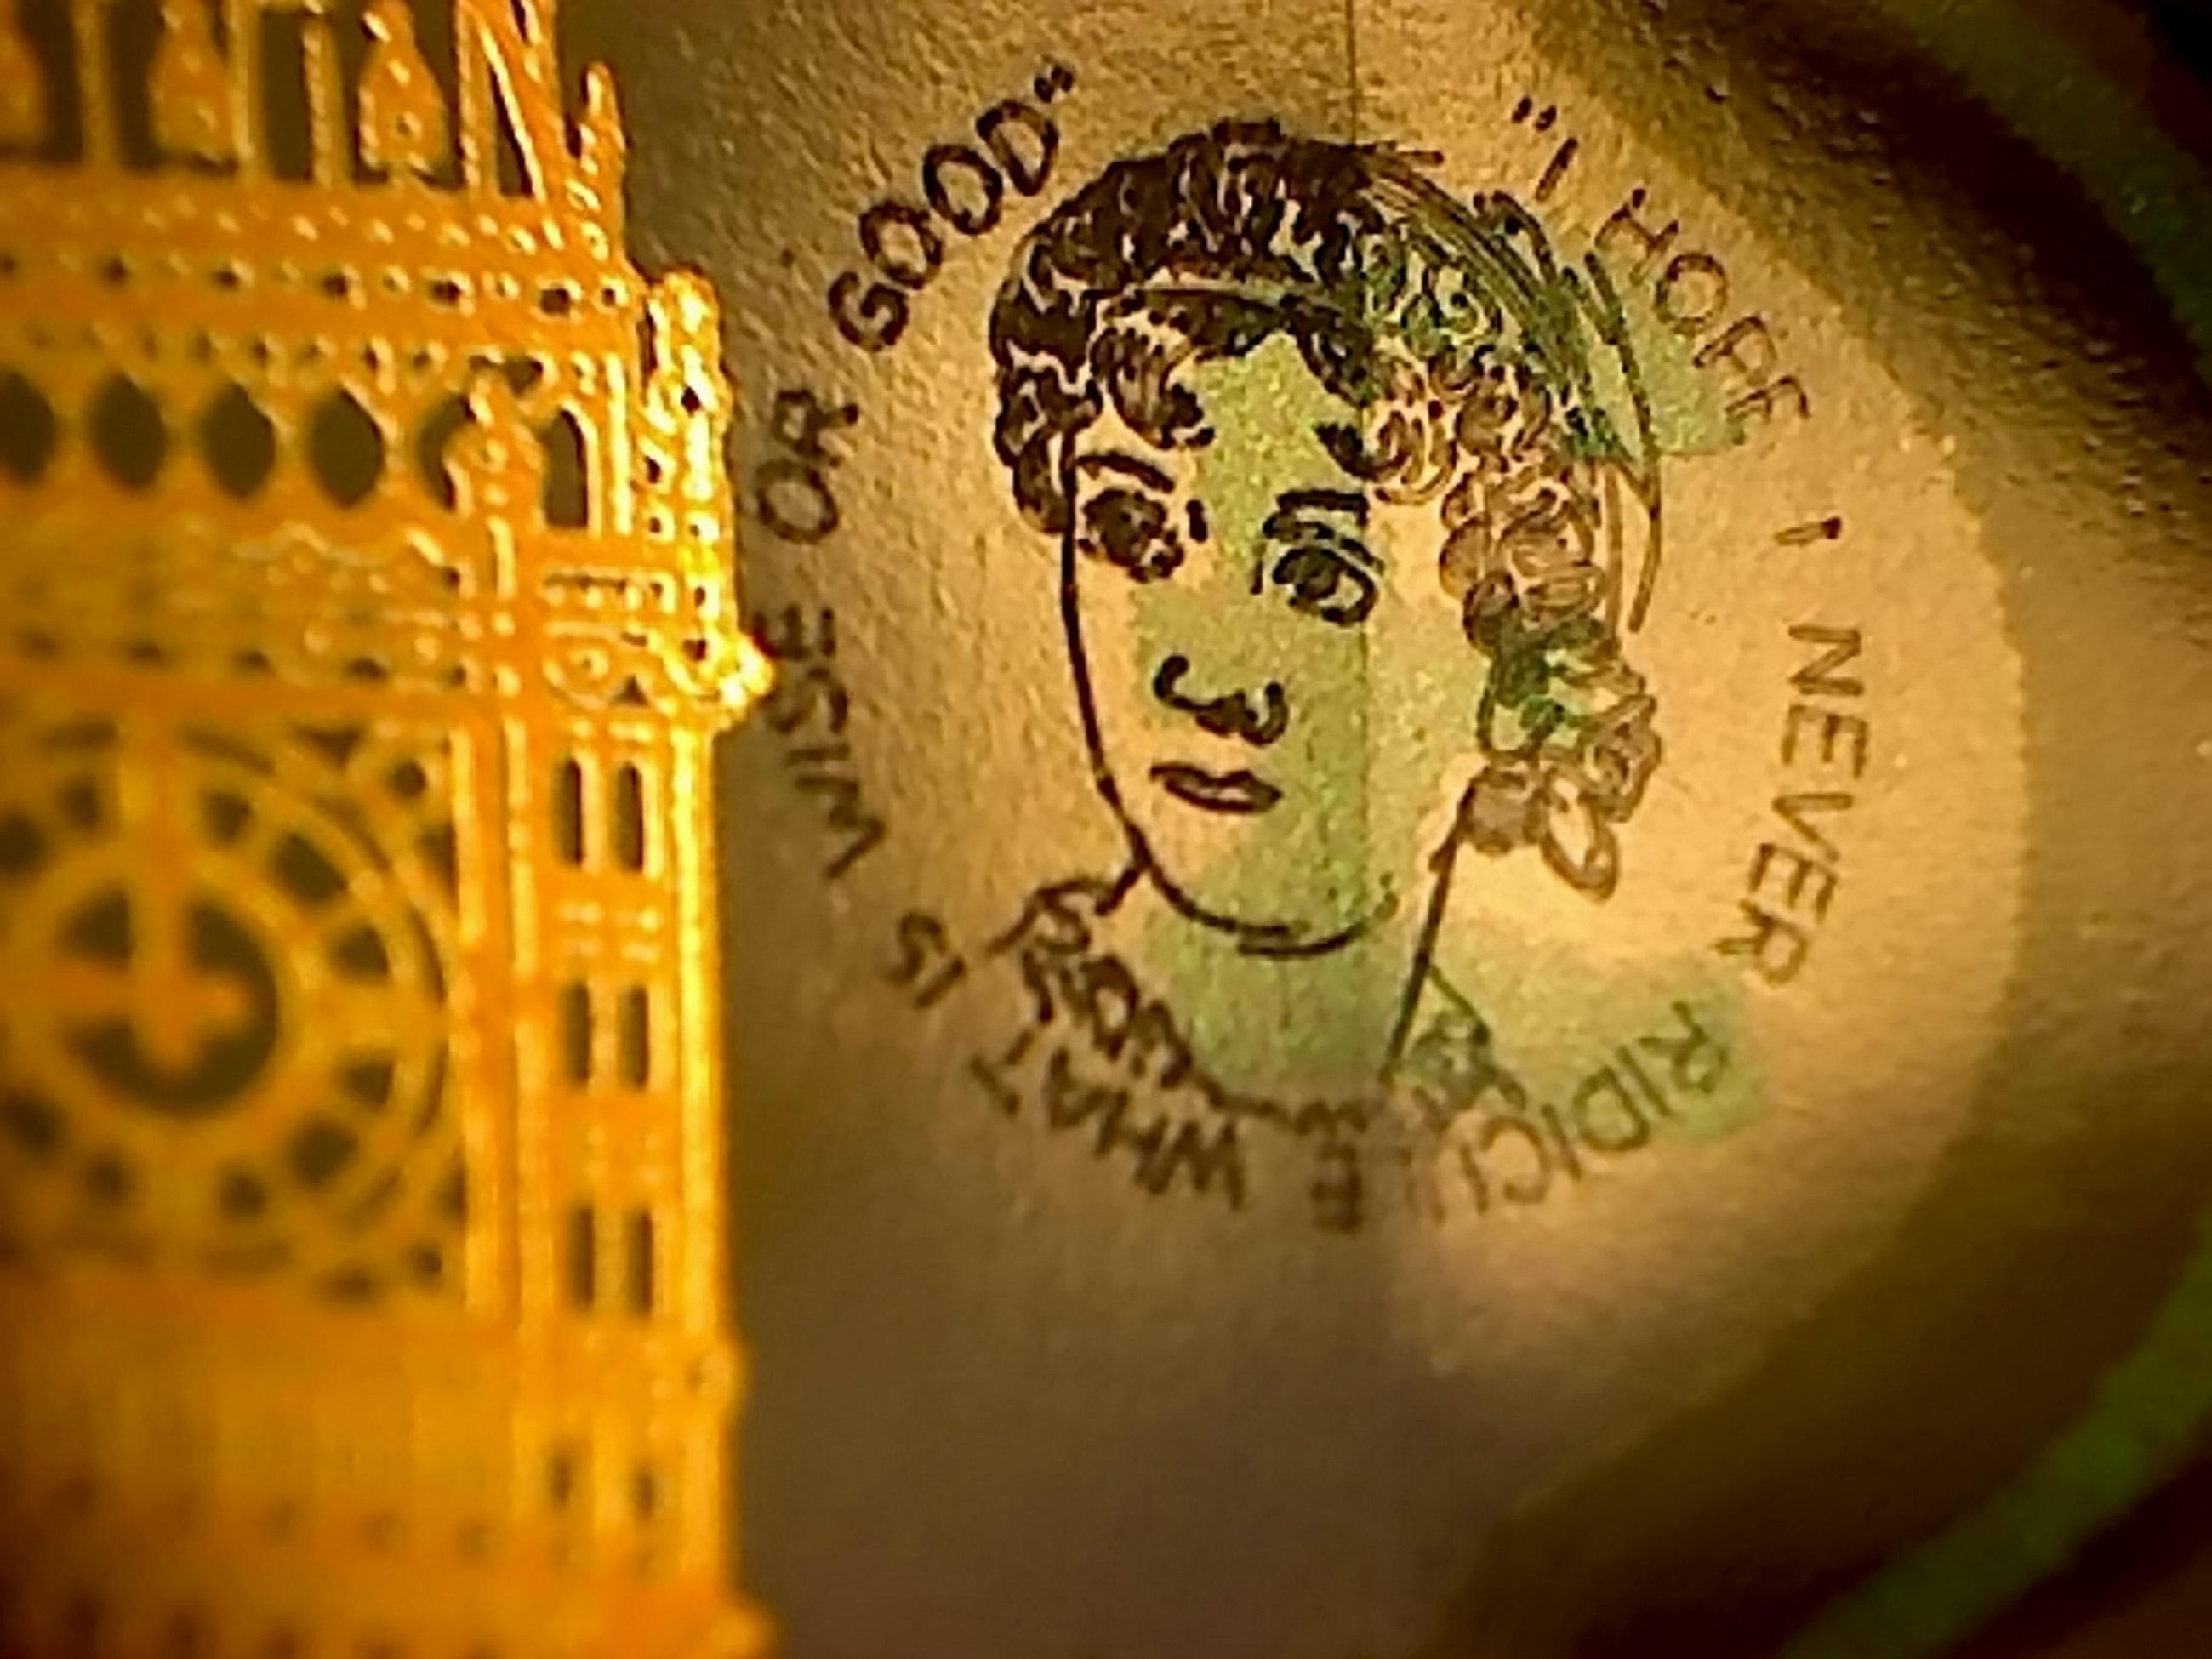 The Jane Austen portrait printed on new five pound